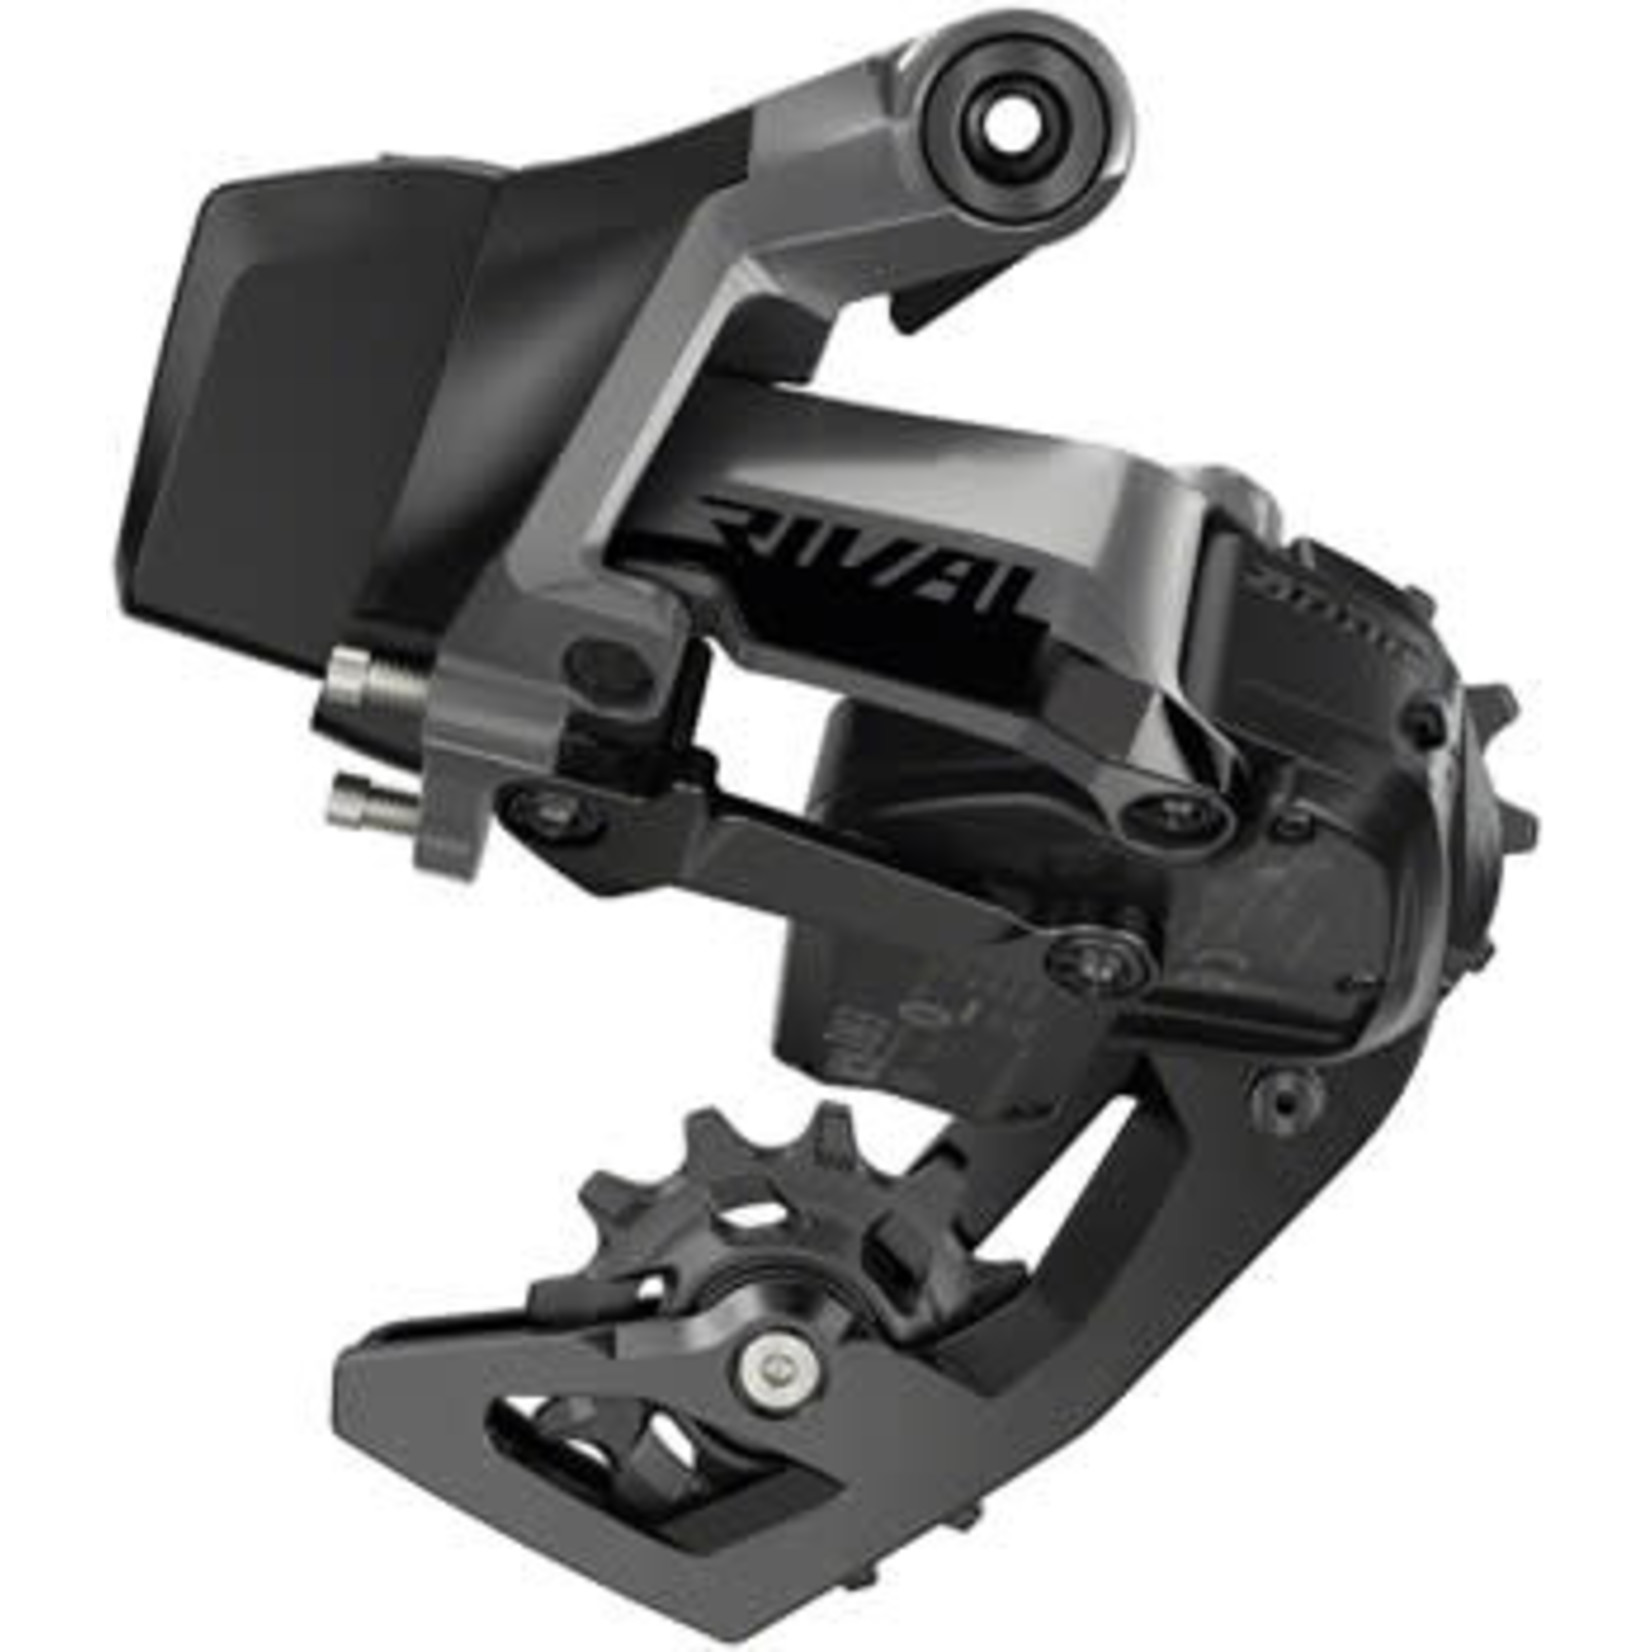 SRAM SRAM Rival eTap AXS D1 Rear Derailleur Speed: 12 Black